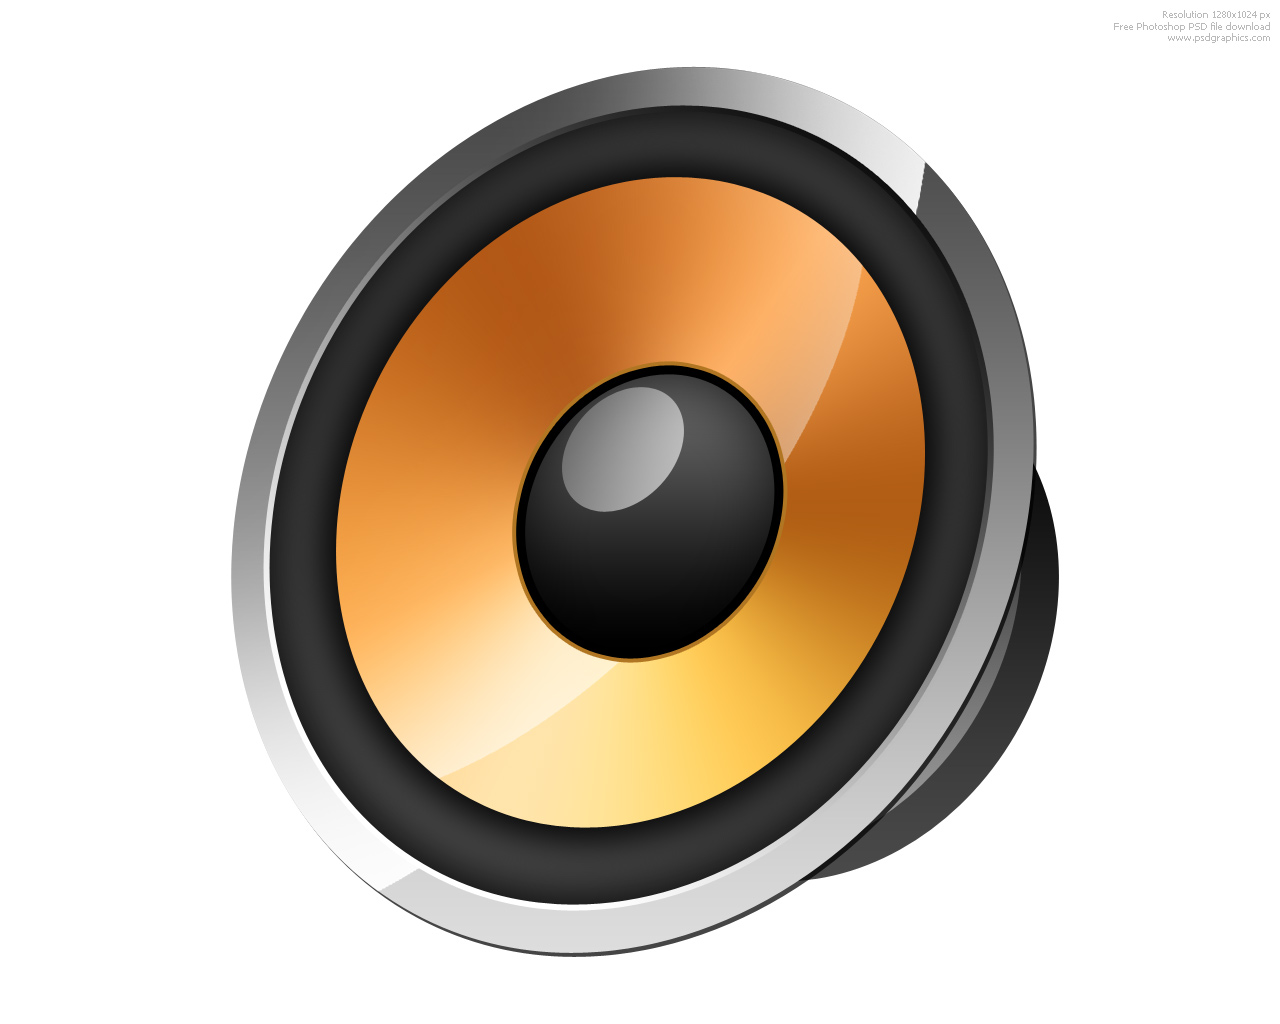 Wwe Wrestlers Profile SoundAudioSpeaker Symbols and